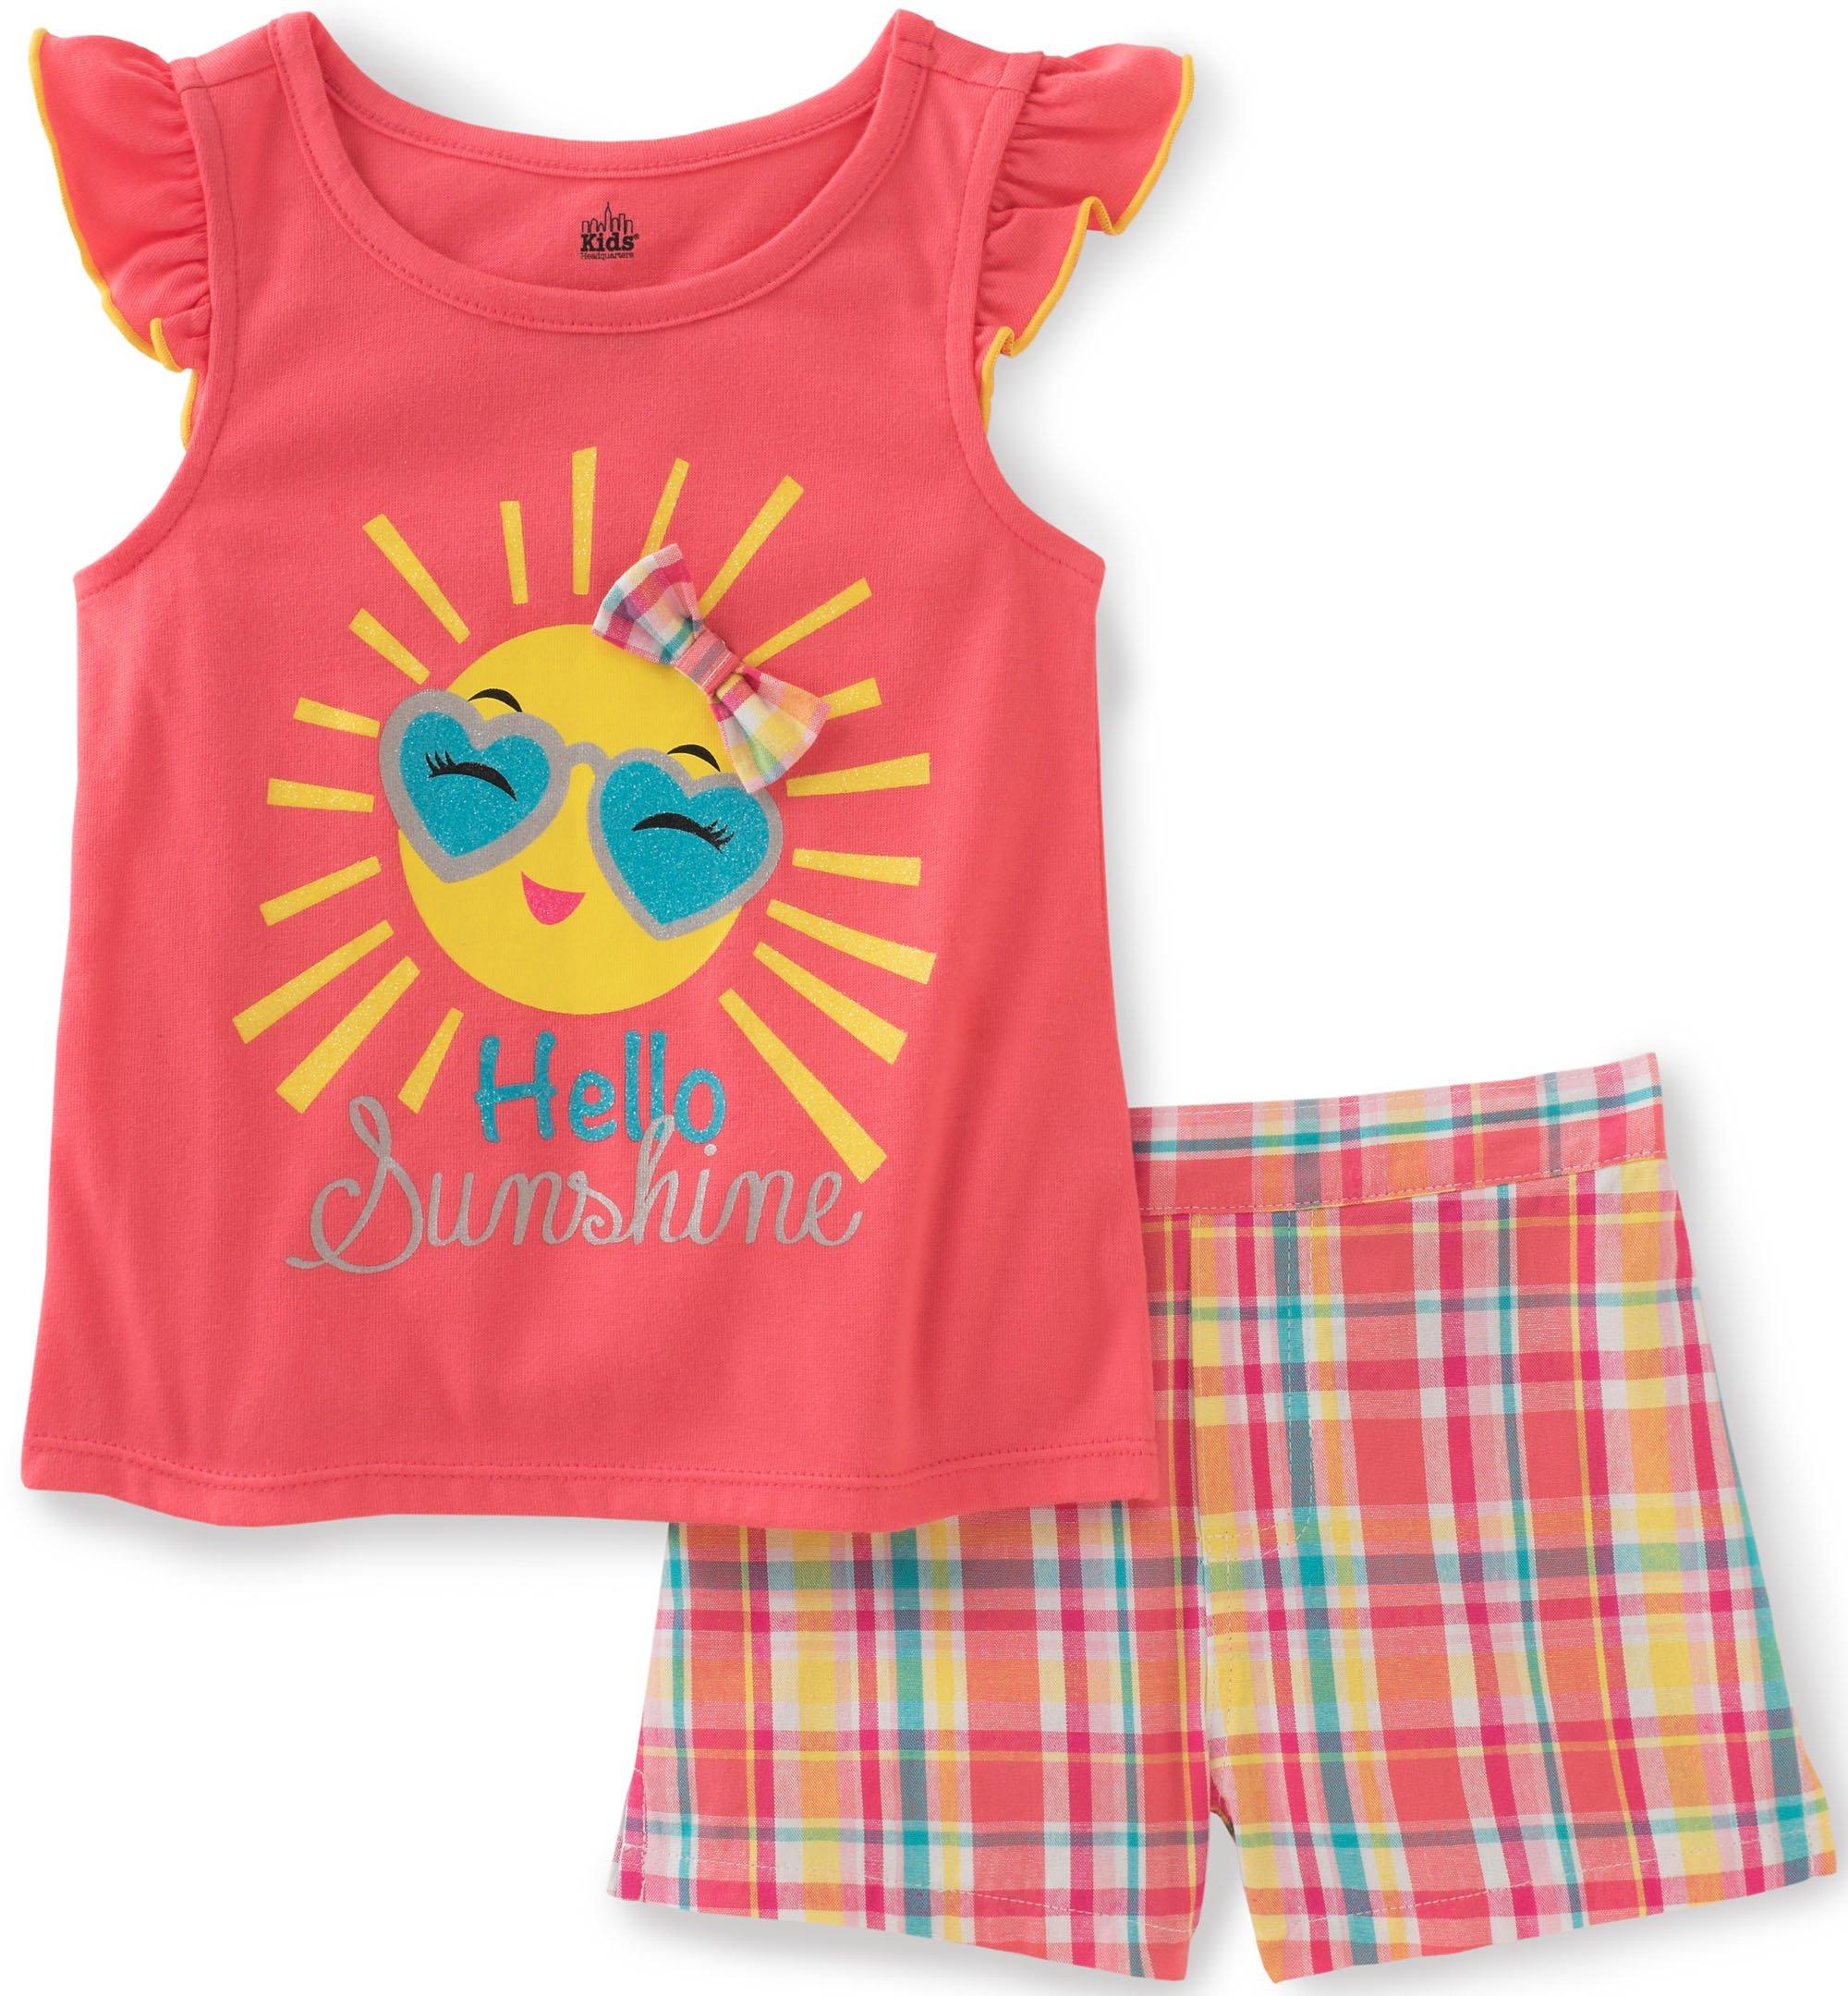 Kids Headquarters Little Girls' Toddler 2 Piece Short Set-Cap Sleeves, Coral/Yellow, 3T